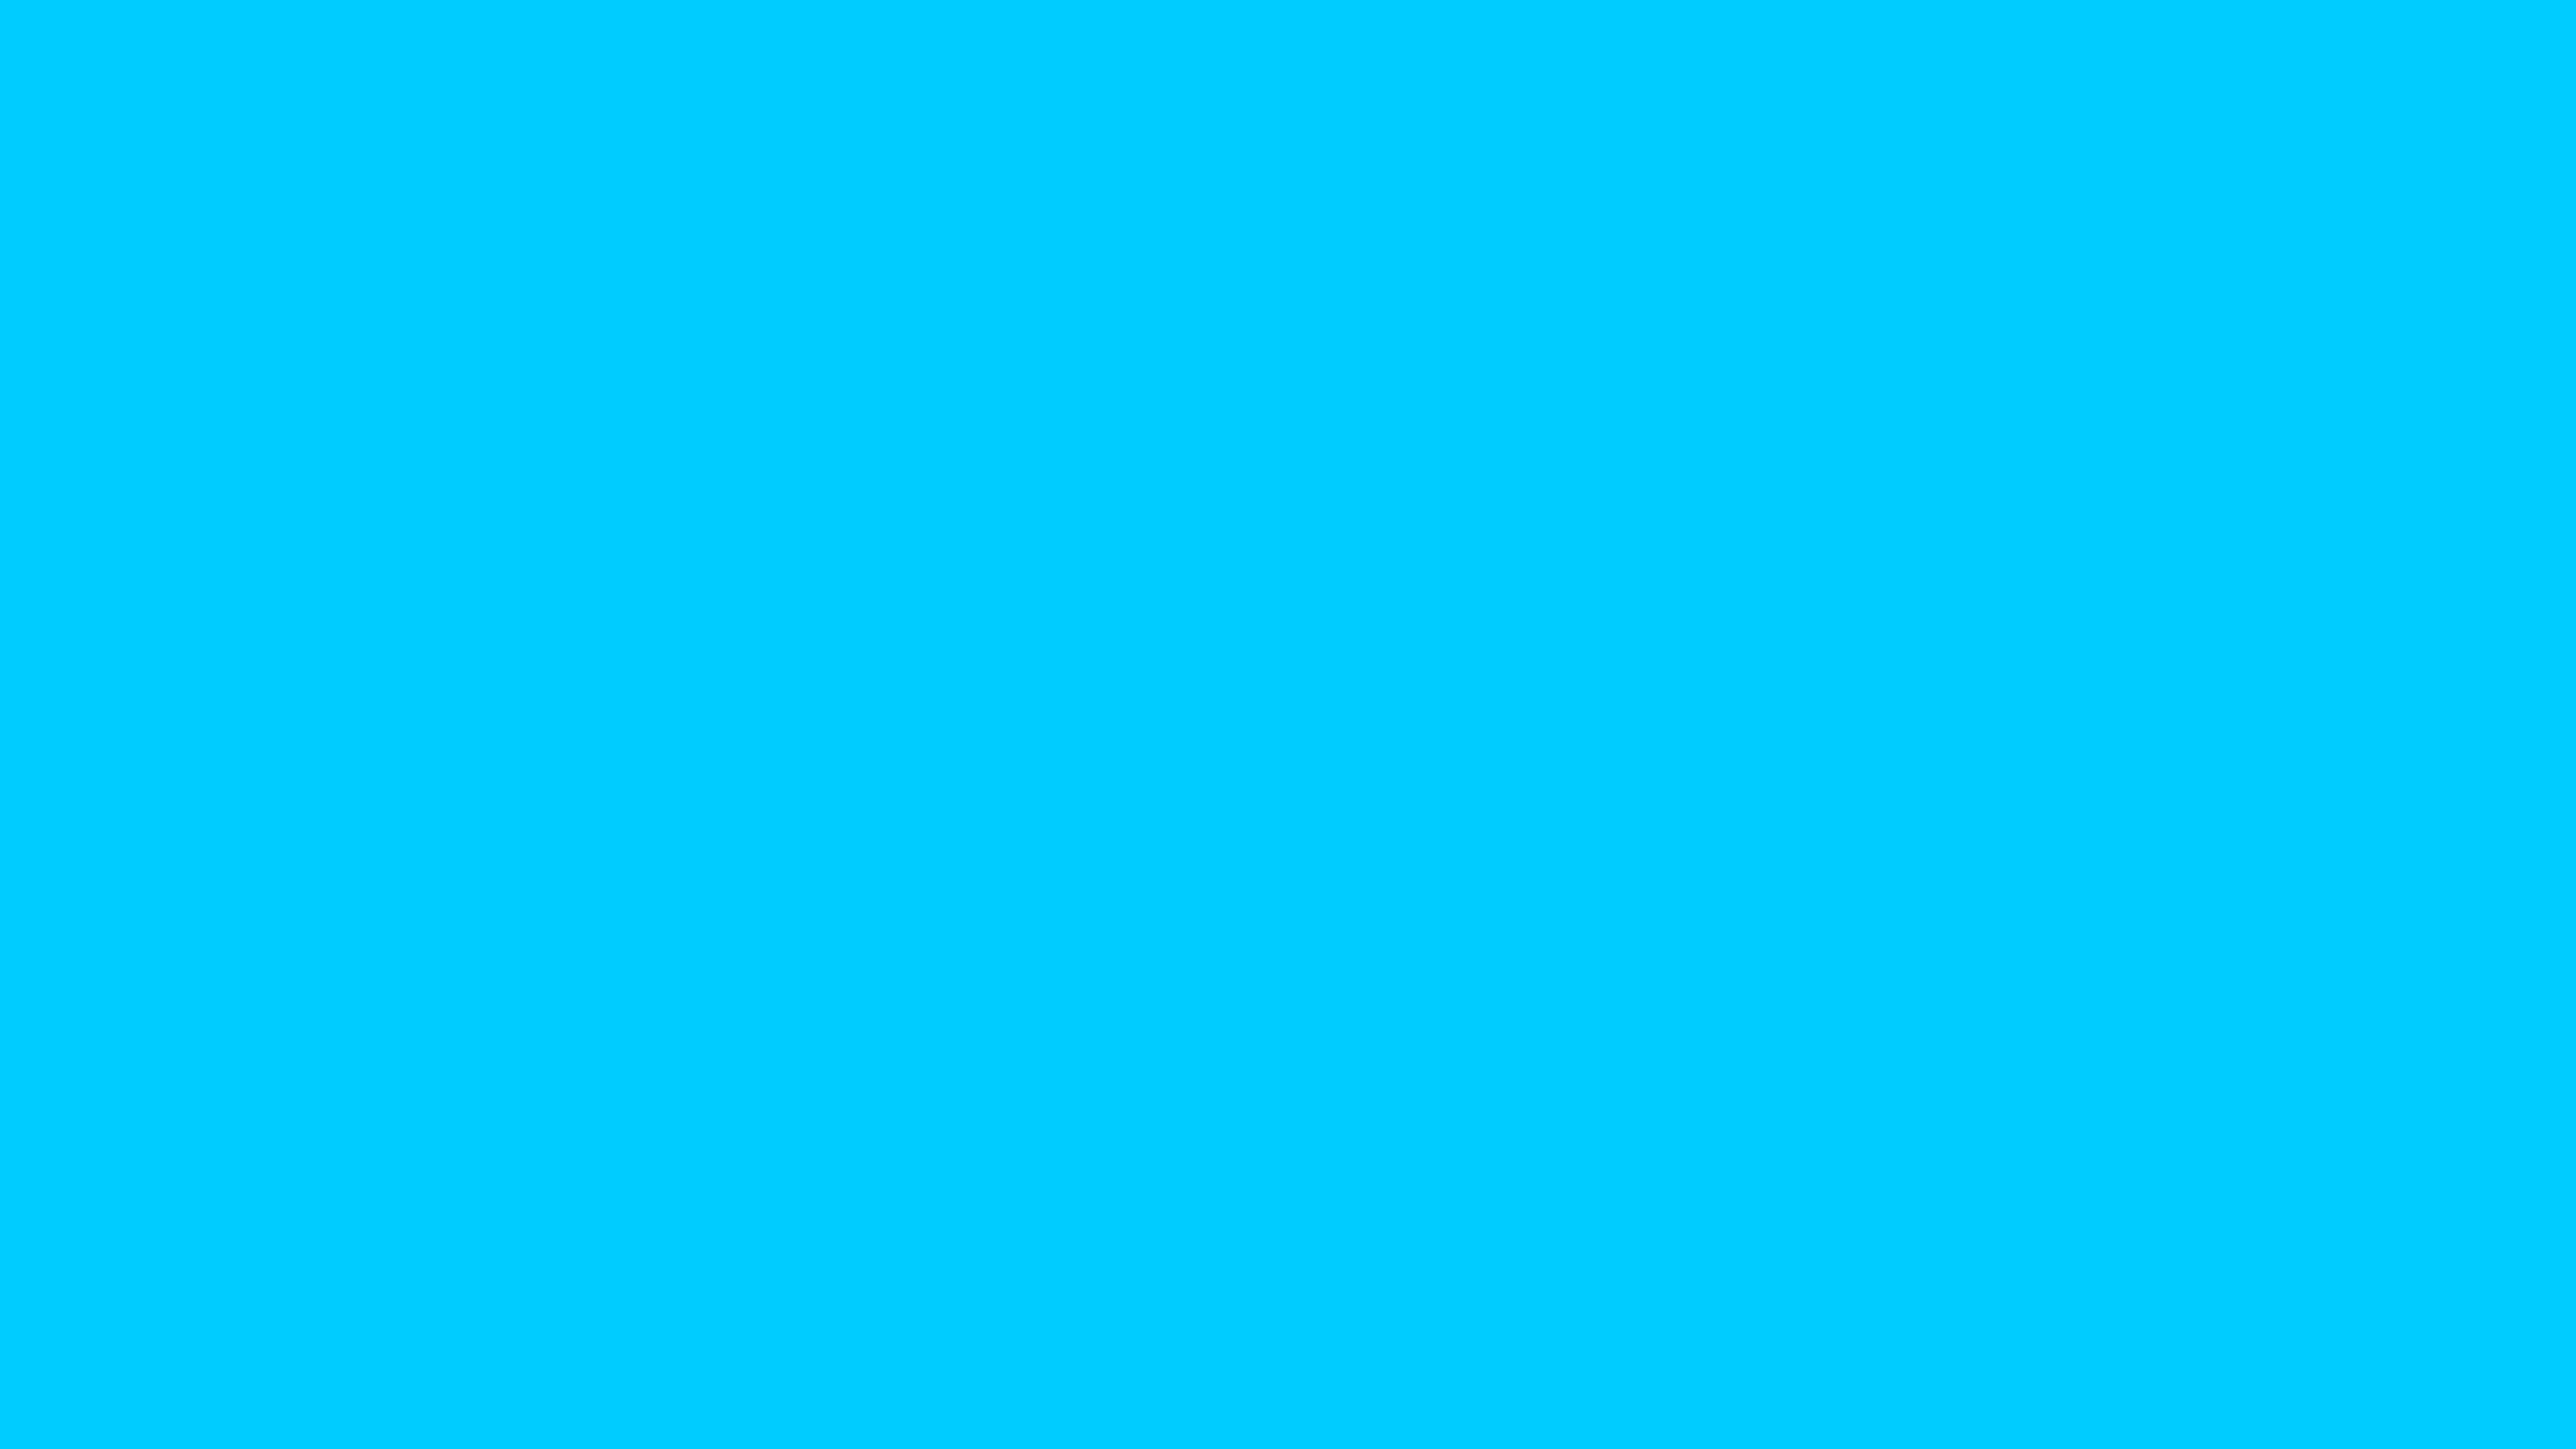 7680x4320 Vivid Sky Blue Solid Color Background